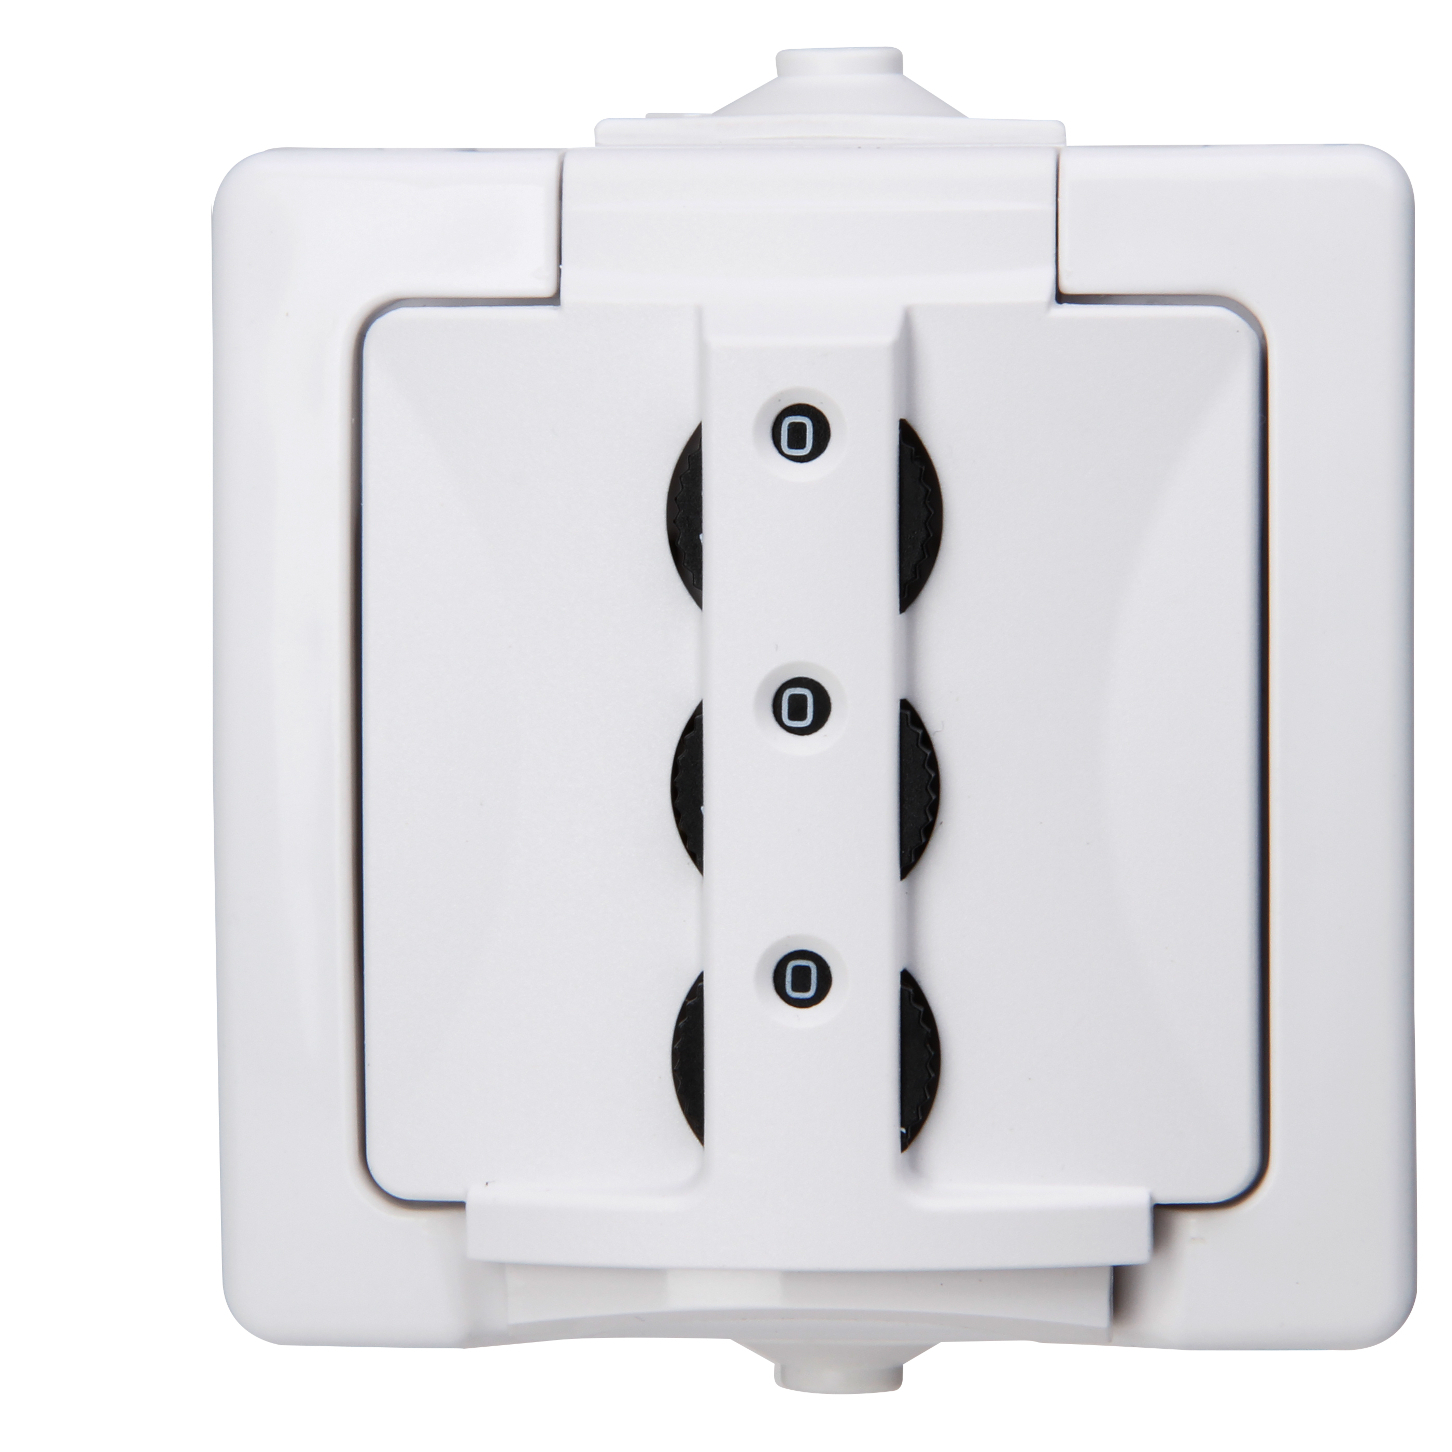 Kopp Nautic AP-FR Schutzkontakt-Steckdose IP44 Zahlenschloss anthrazit sicher